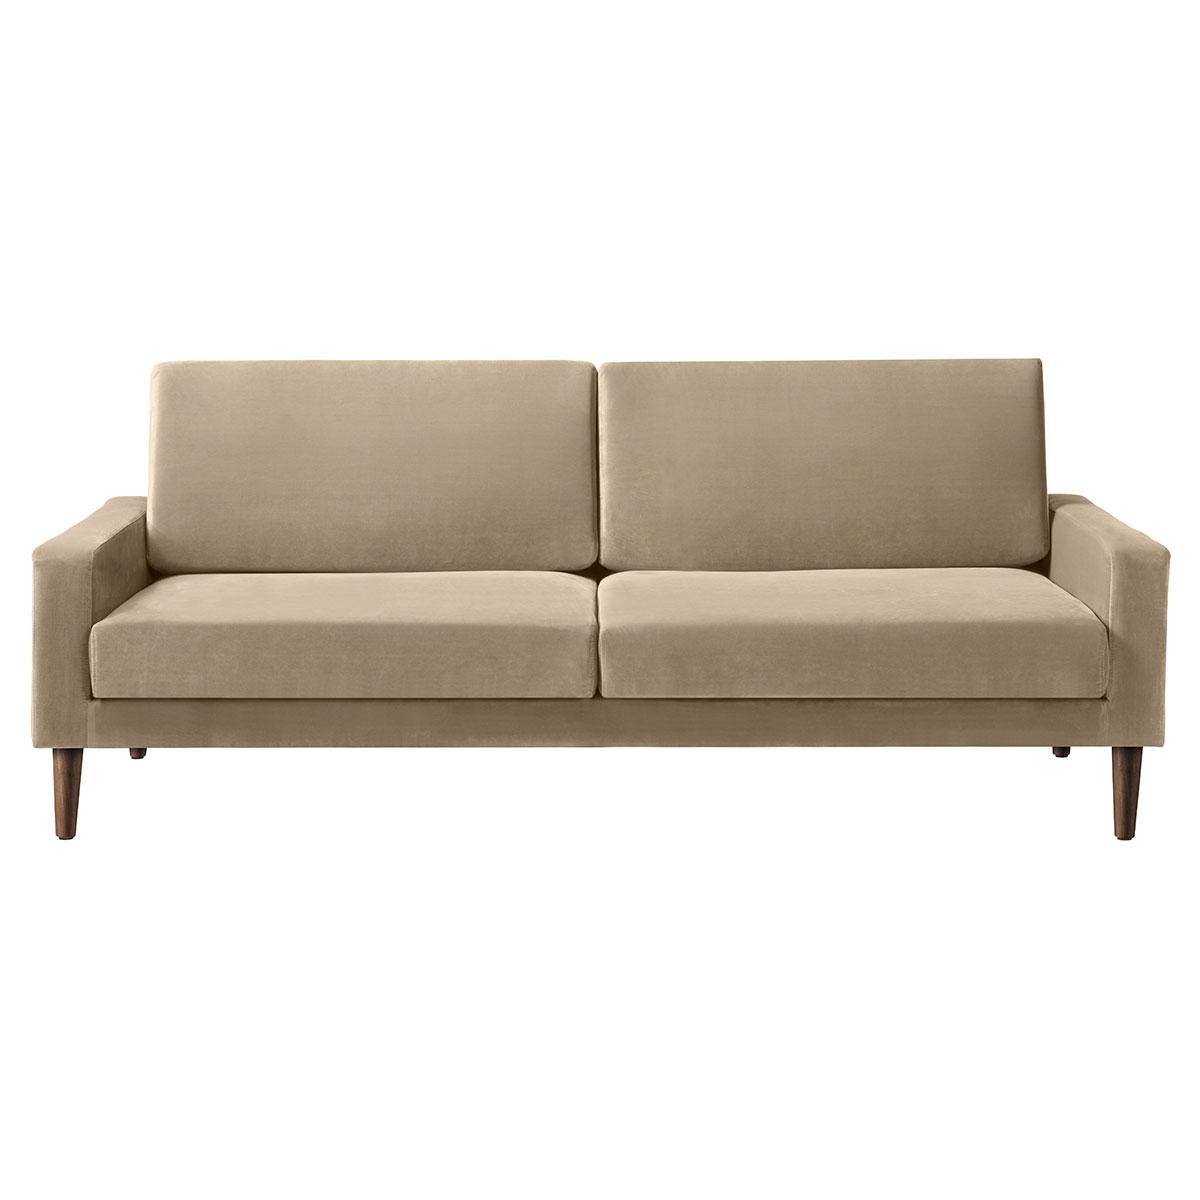 Living&more 3 pers. sofa - Viktoria - Sand